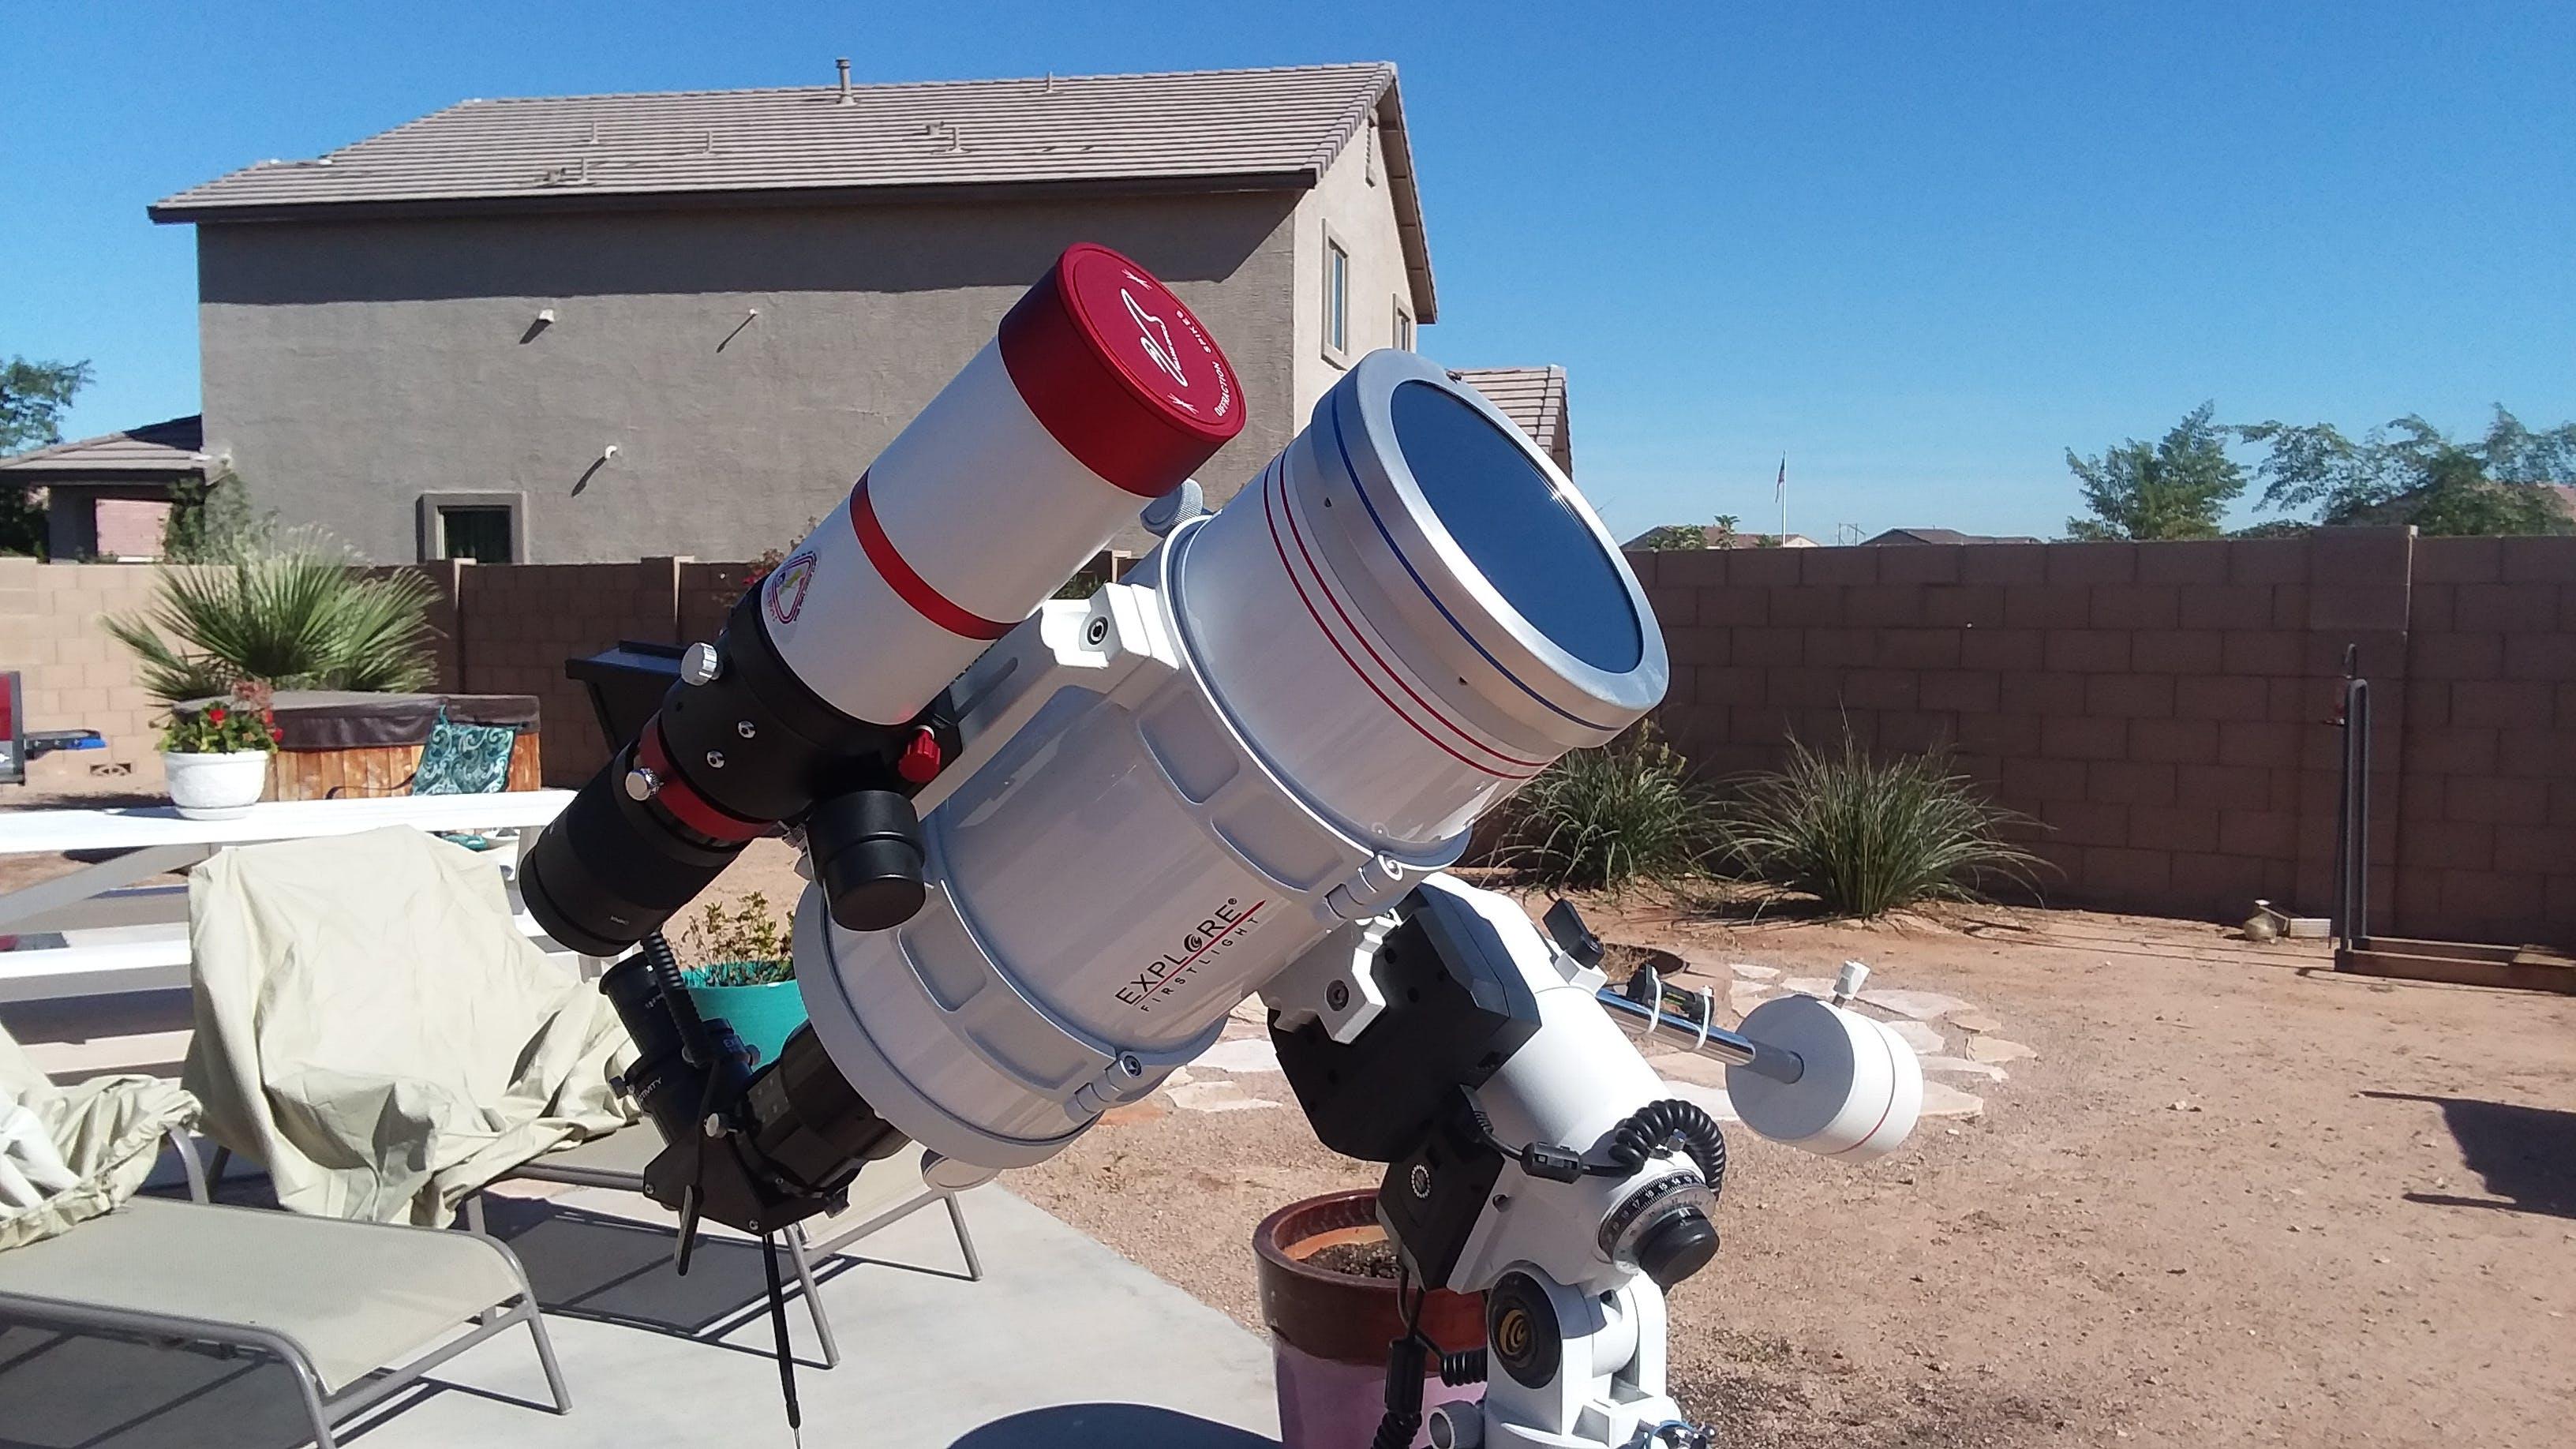 Meade polaris mm f equatorial reflector telescope